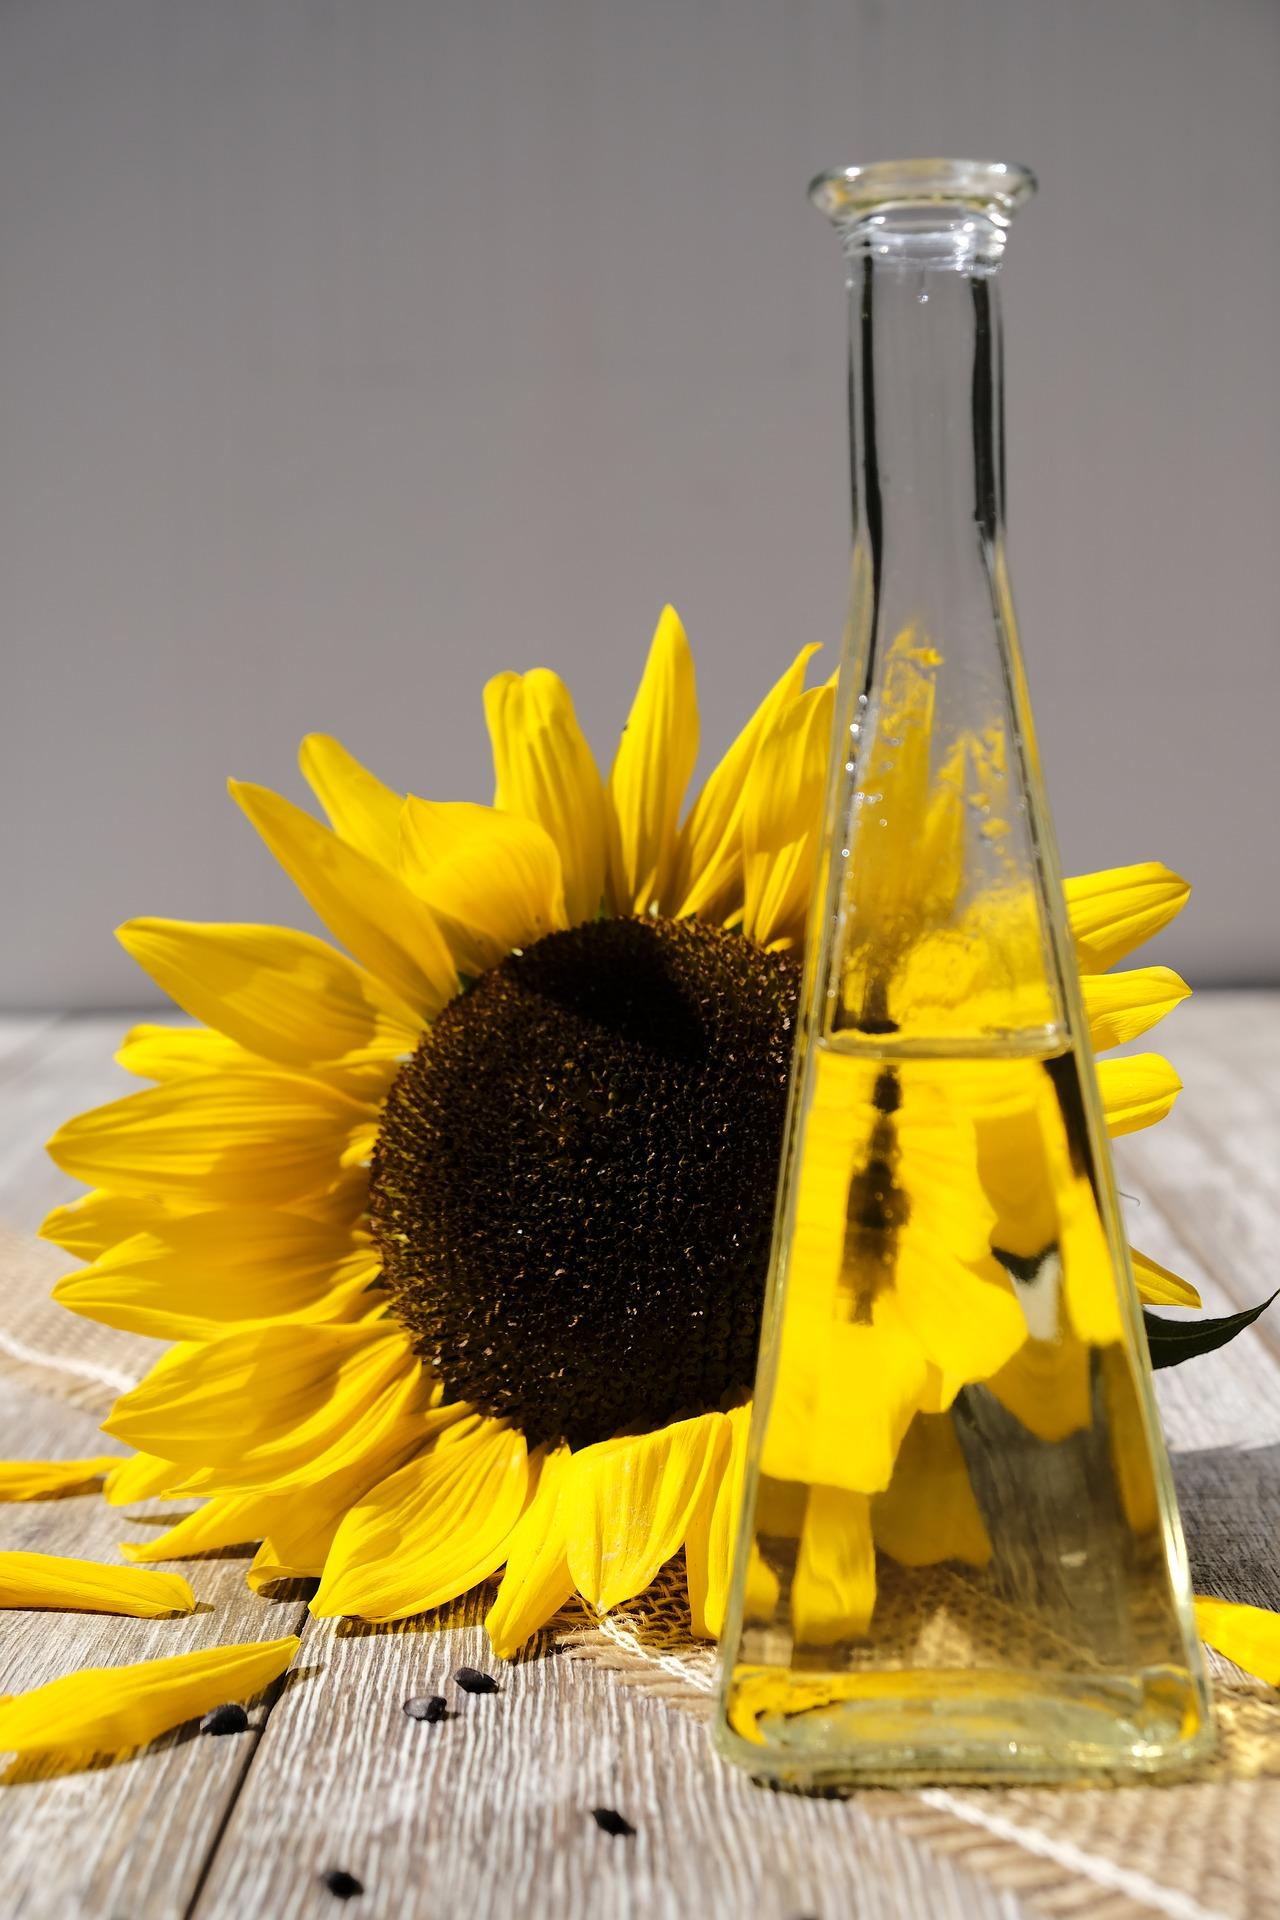 A quoi sert la vitamine E  dans les cosmétiques ?